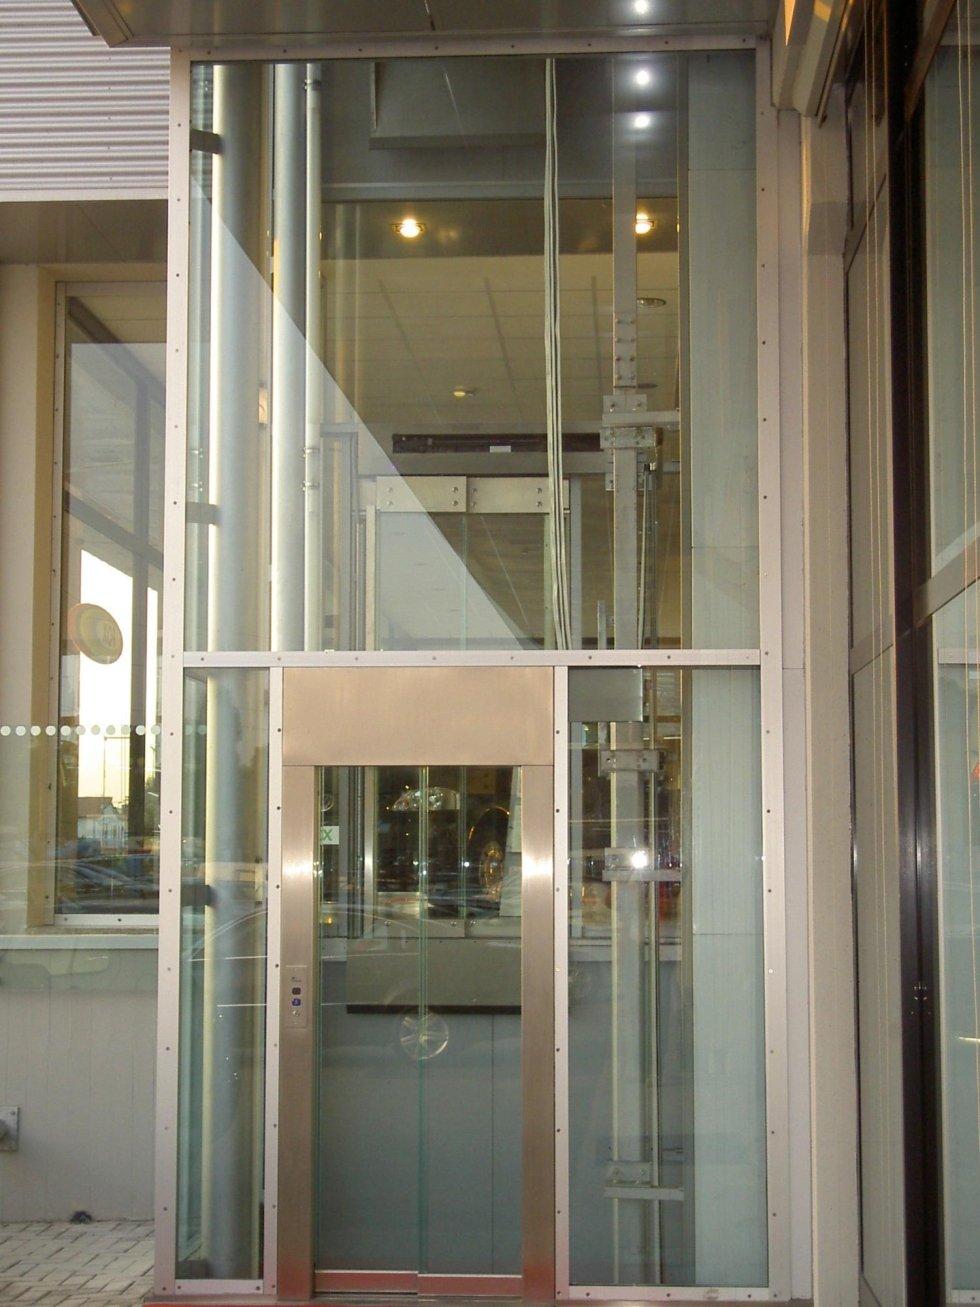 ascensore panoramico-vista esterna